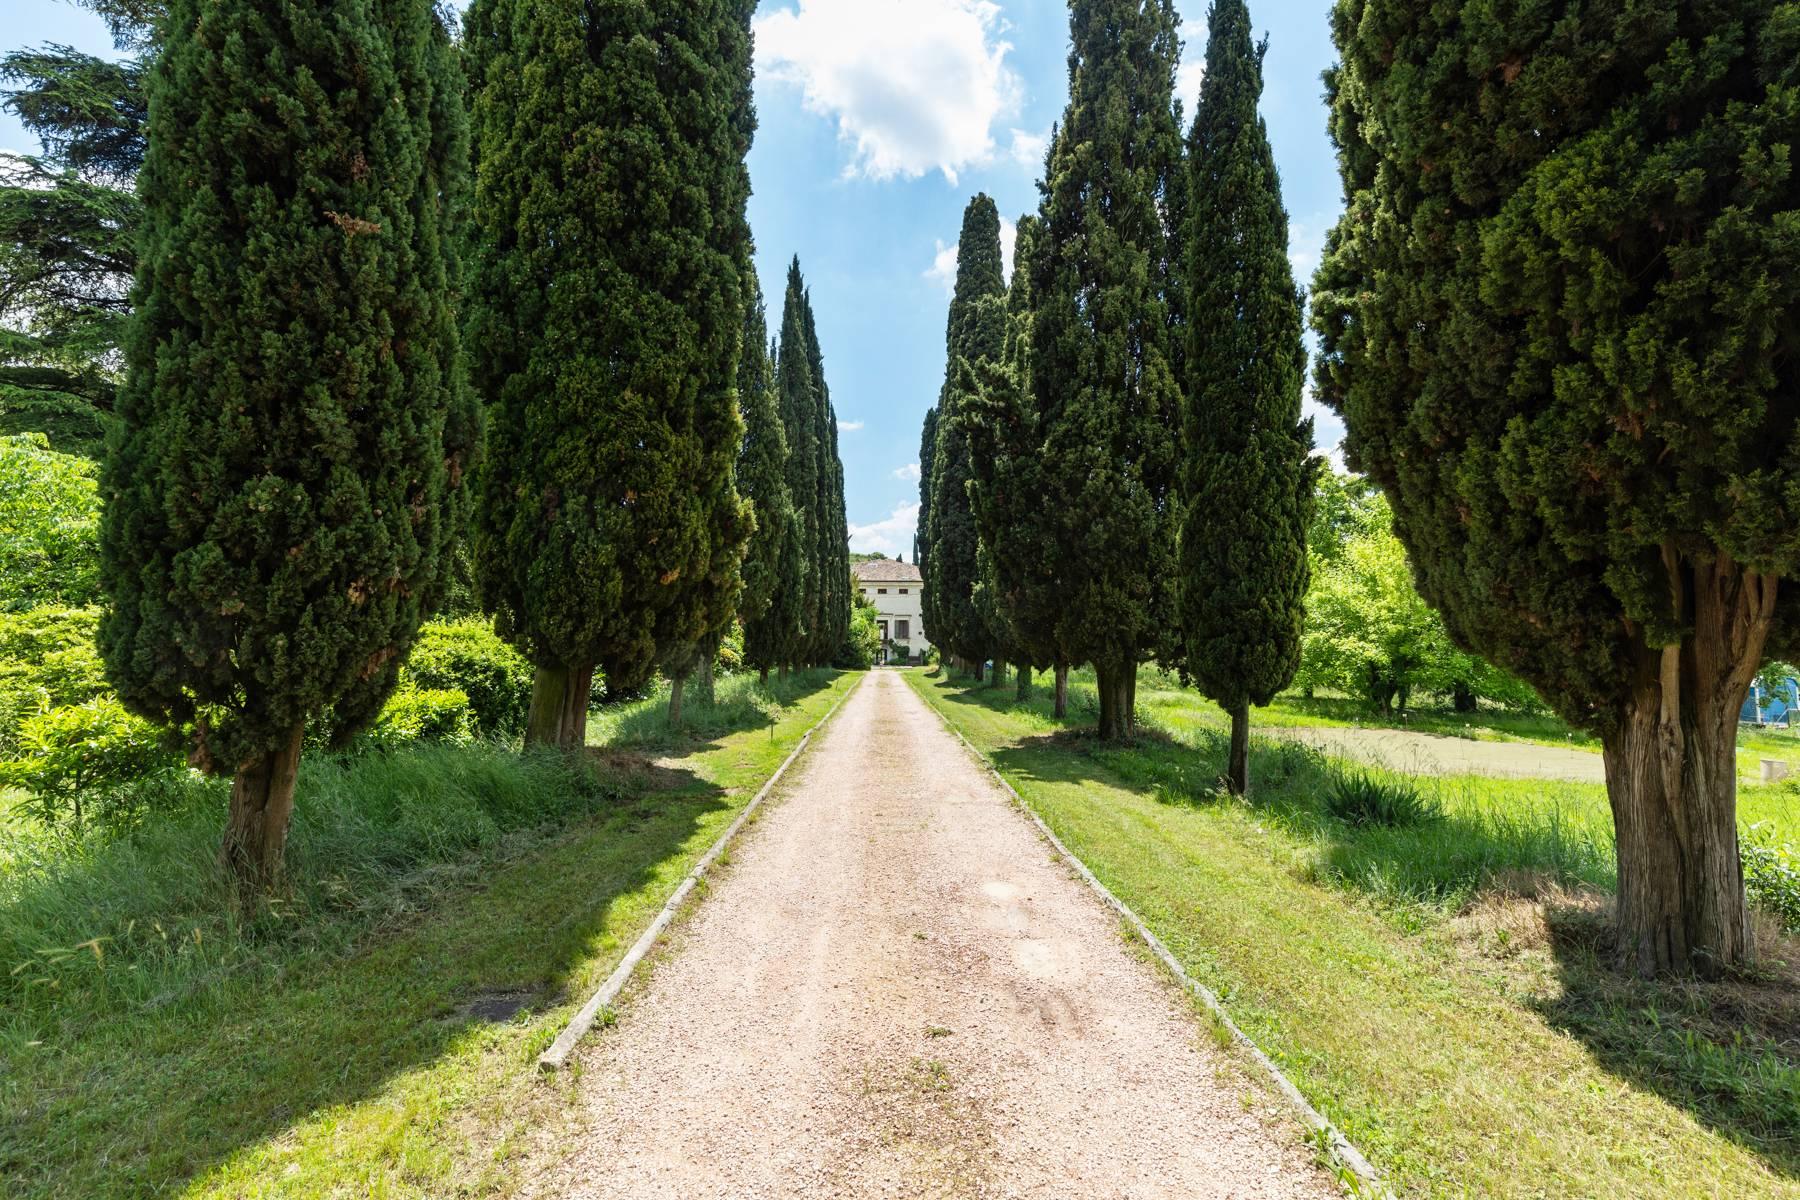 Villa in Vendita a Verona: 5 locali, 2400 mq - Foto 15